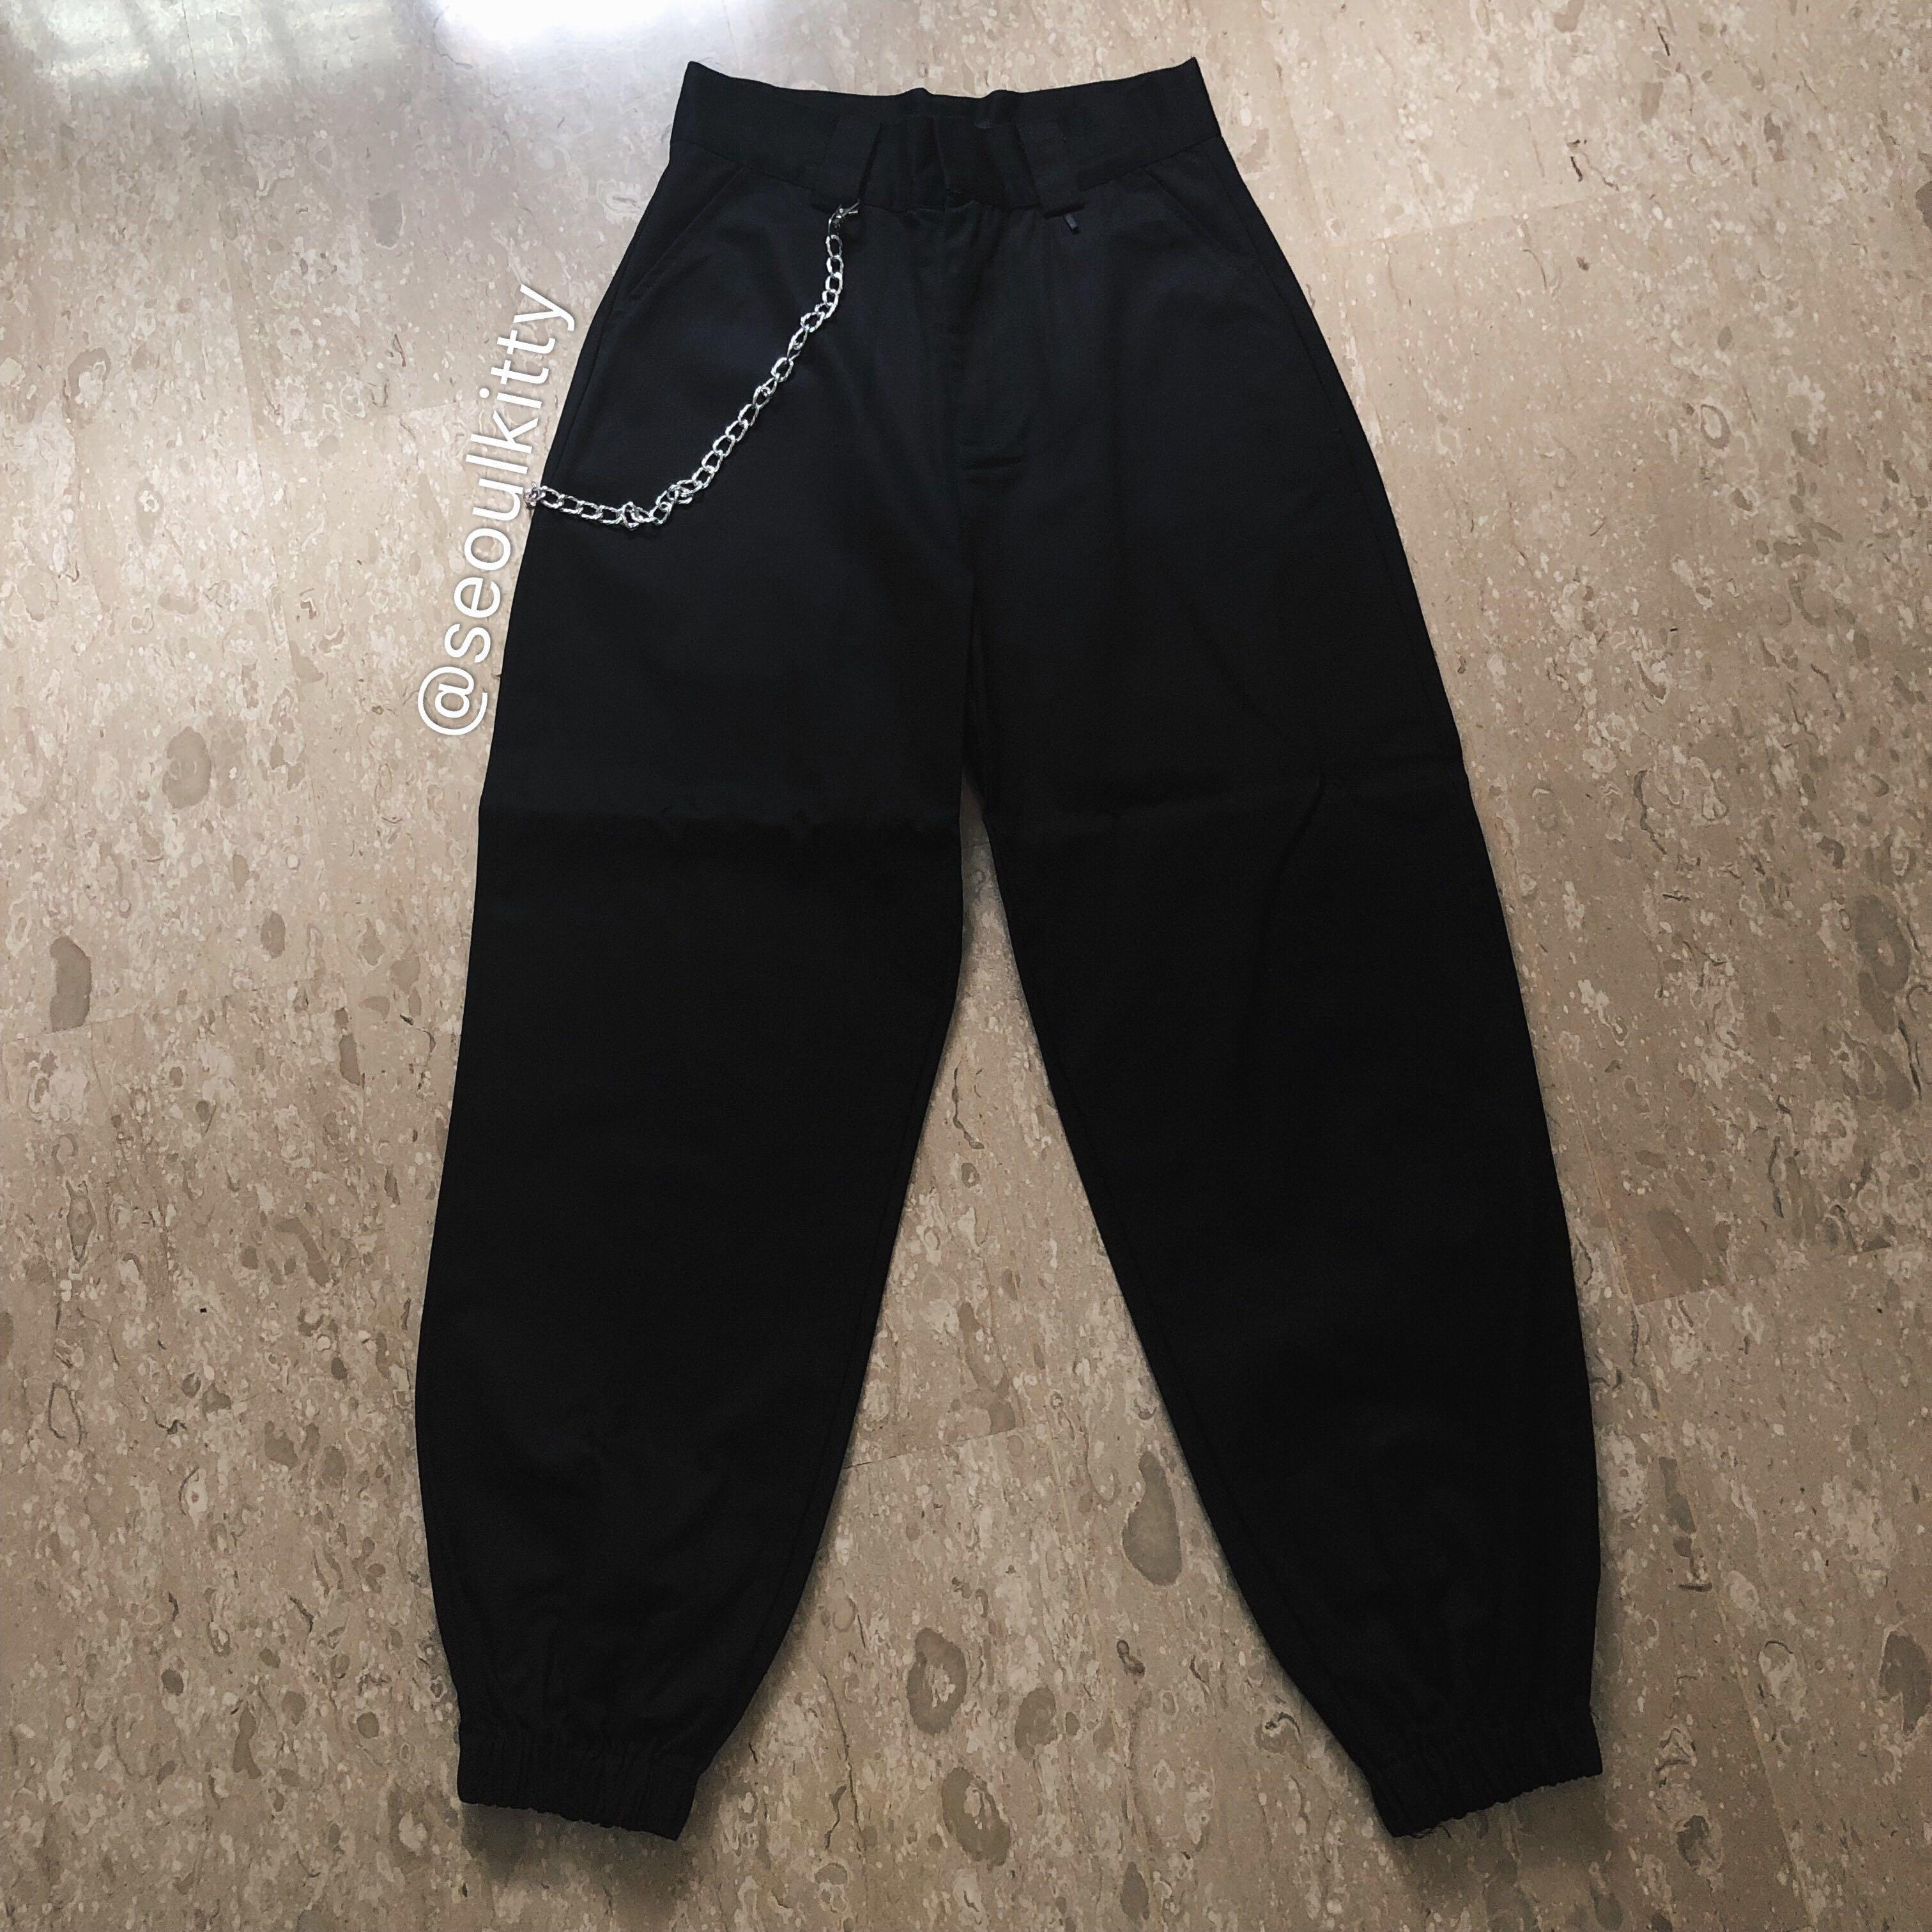 iamgia inspired cobain cargo pants